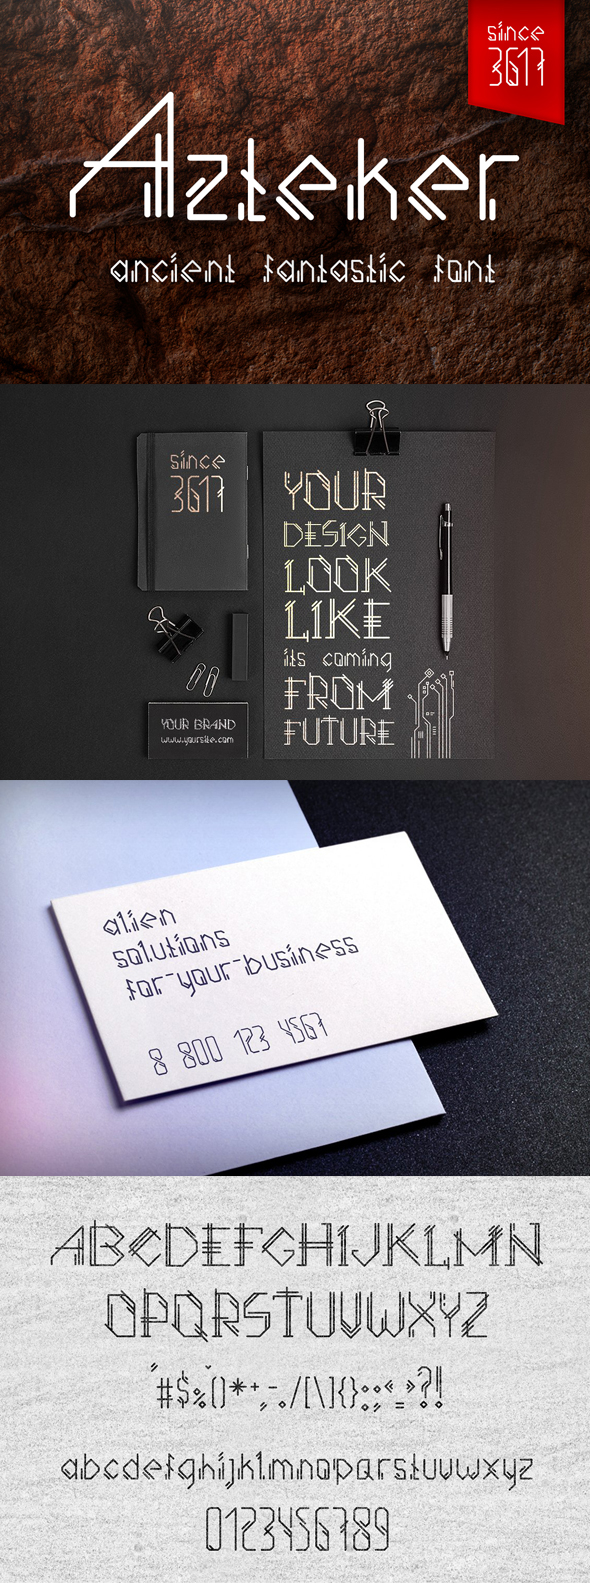 Azteker - Ancient Fantastic Font - Sans-Serif Fonts